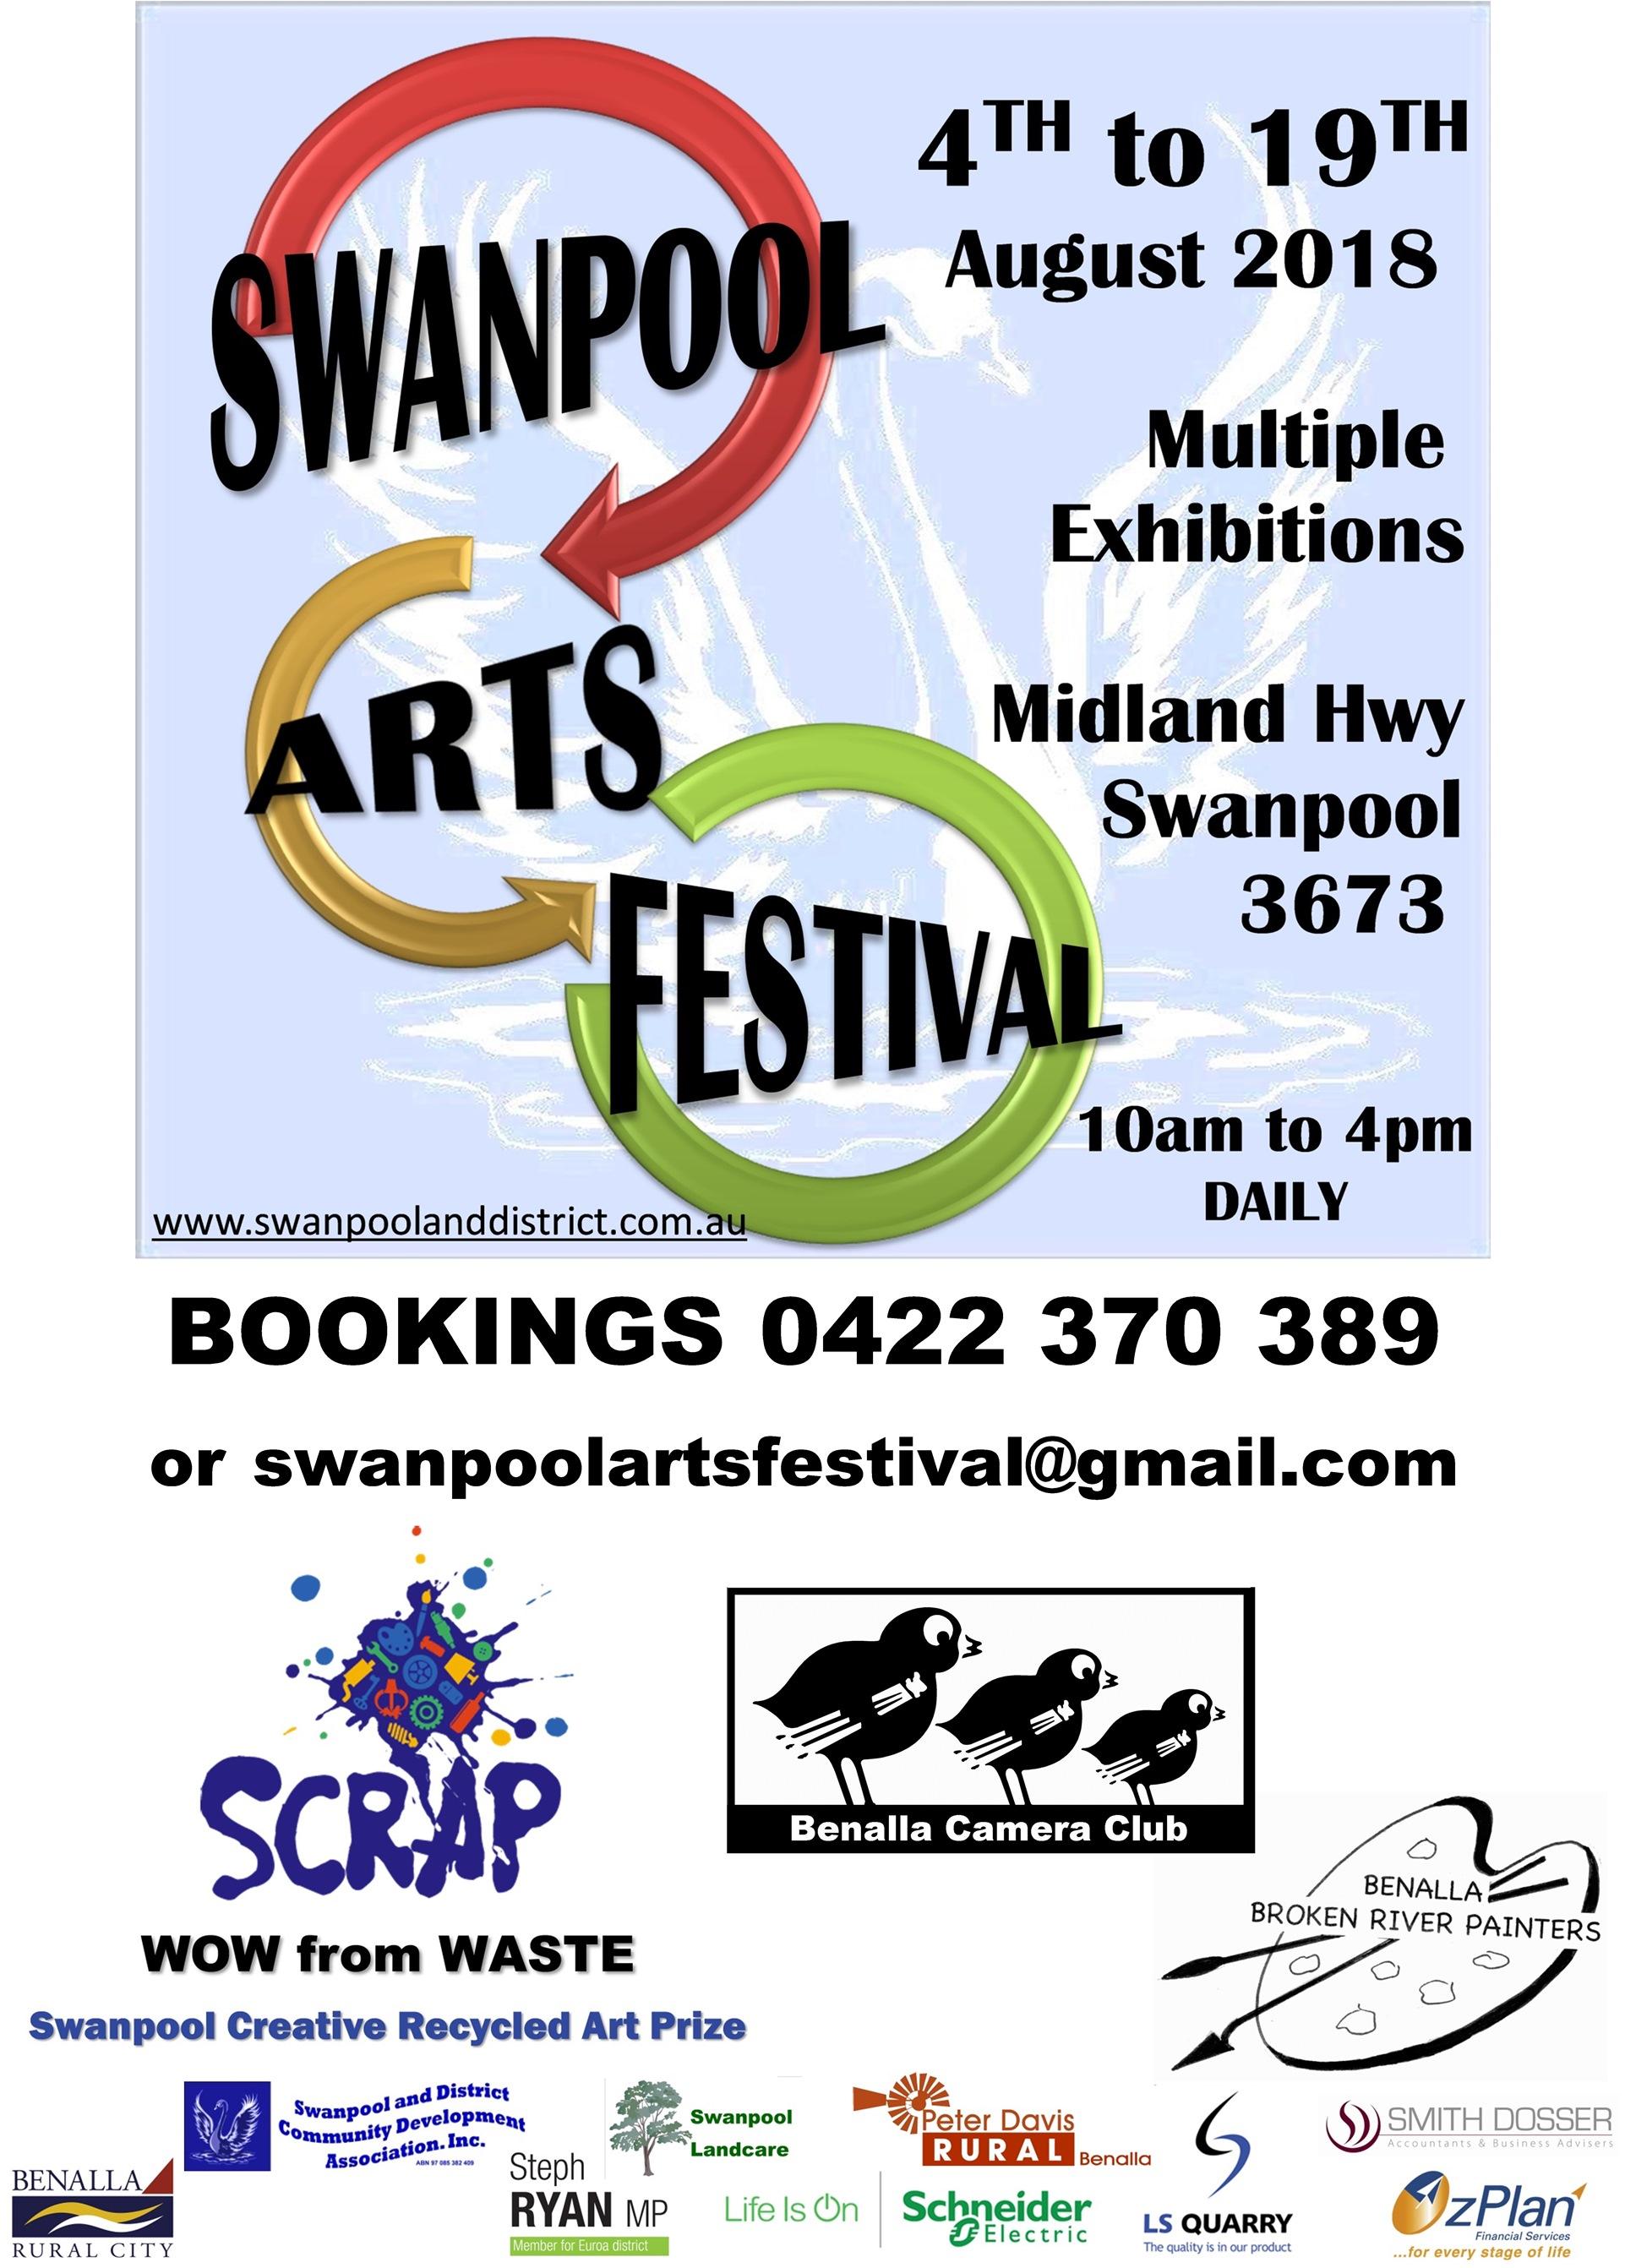 Swanpool Art